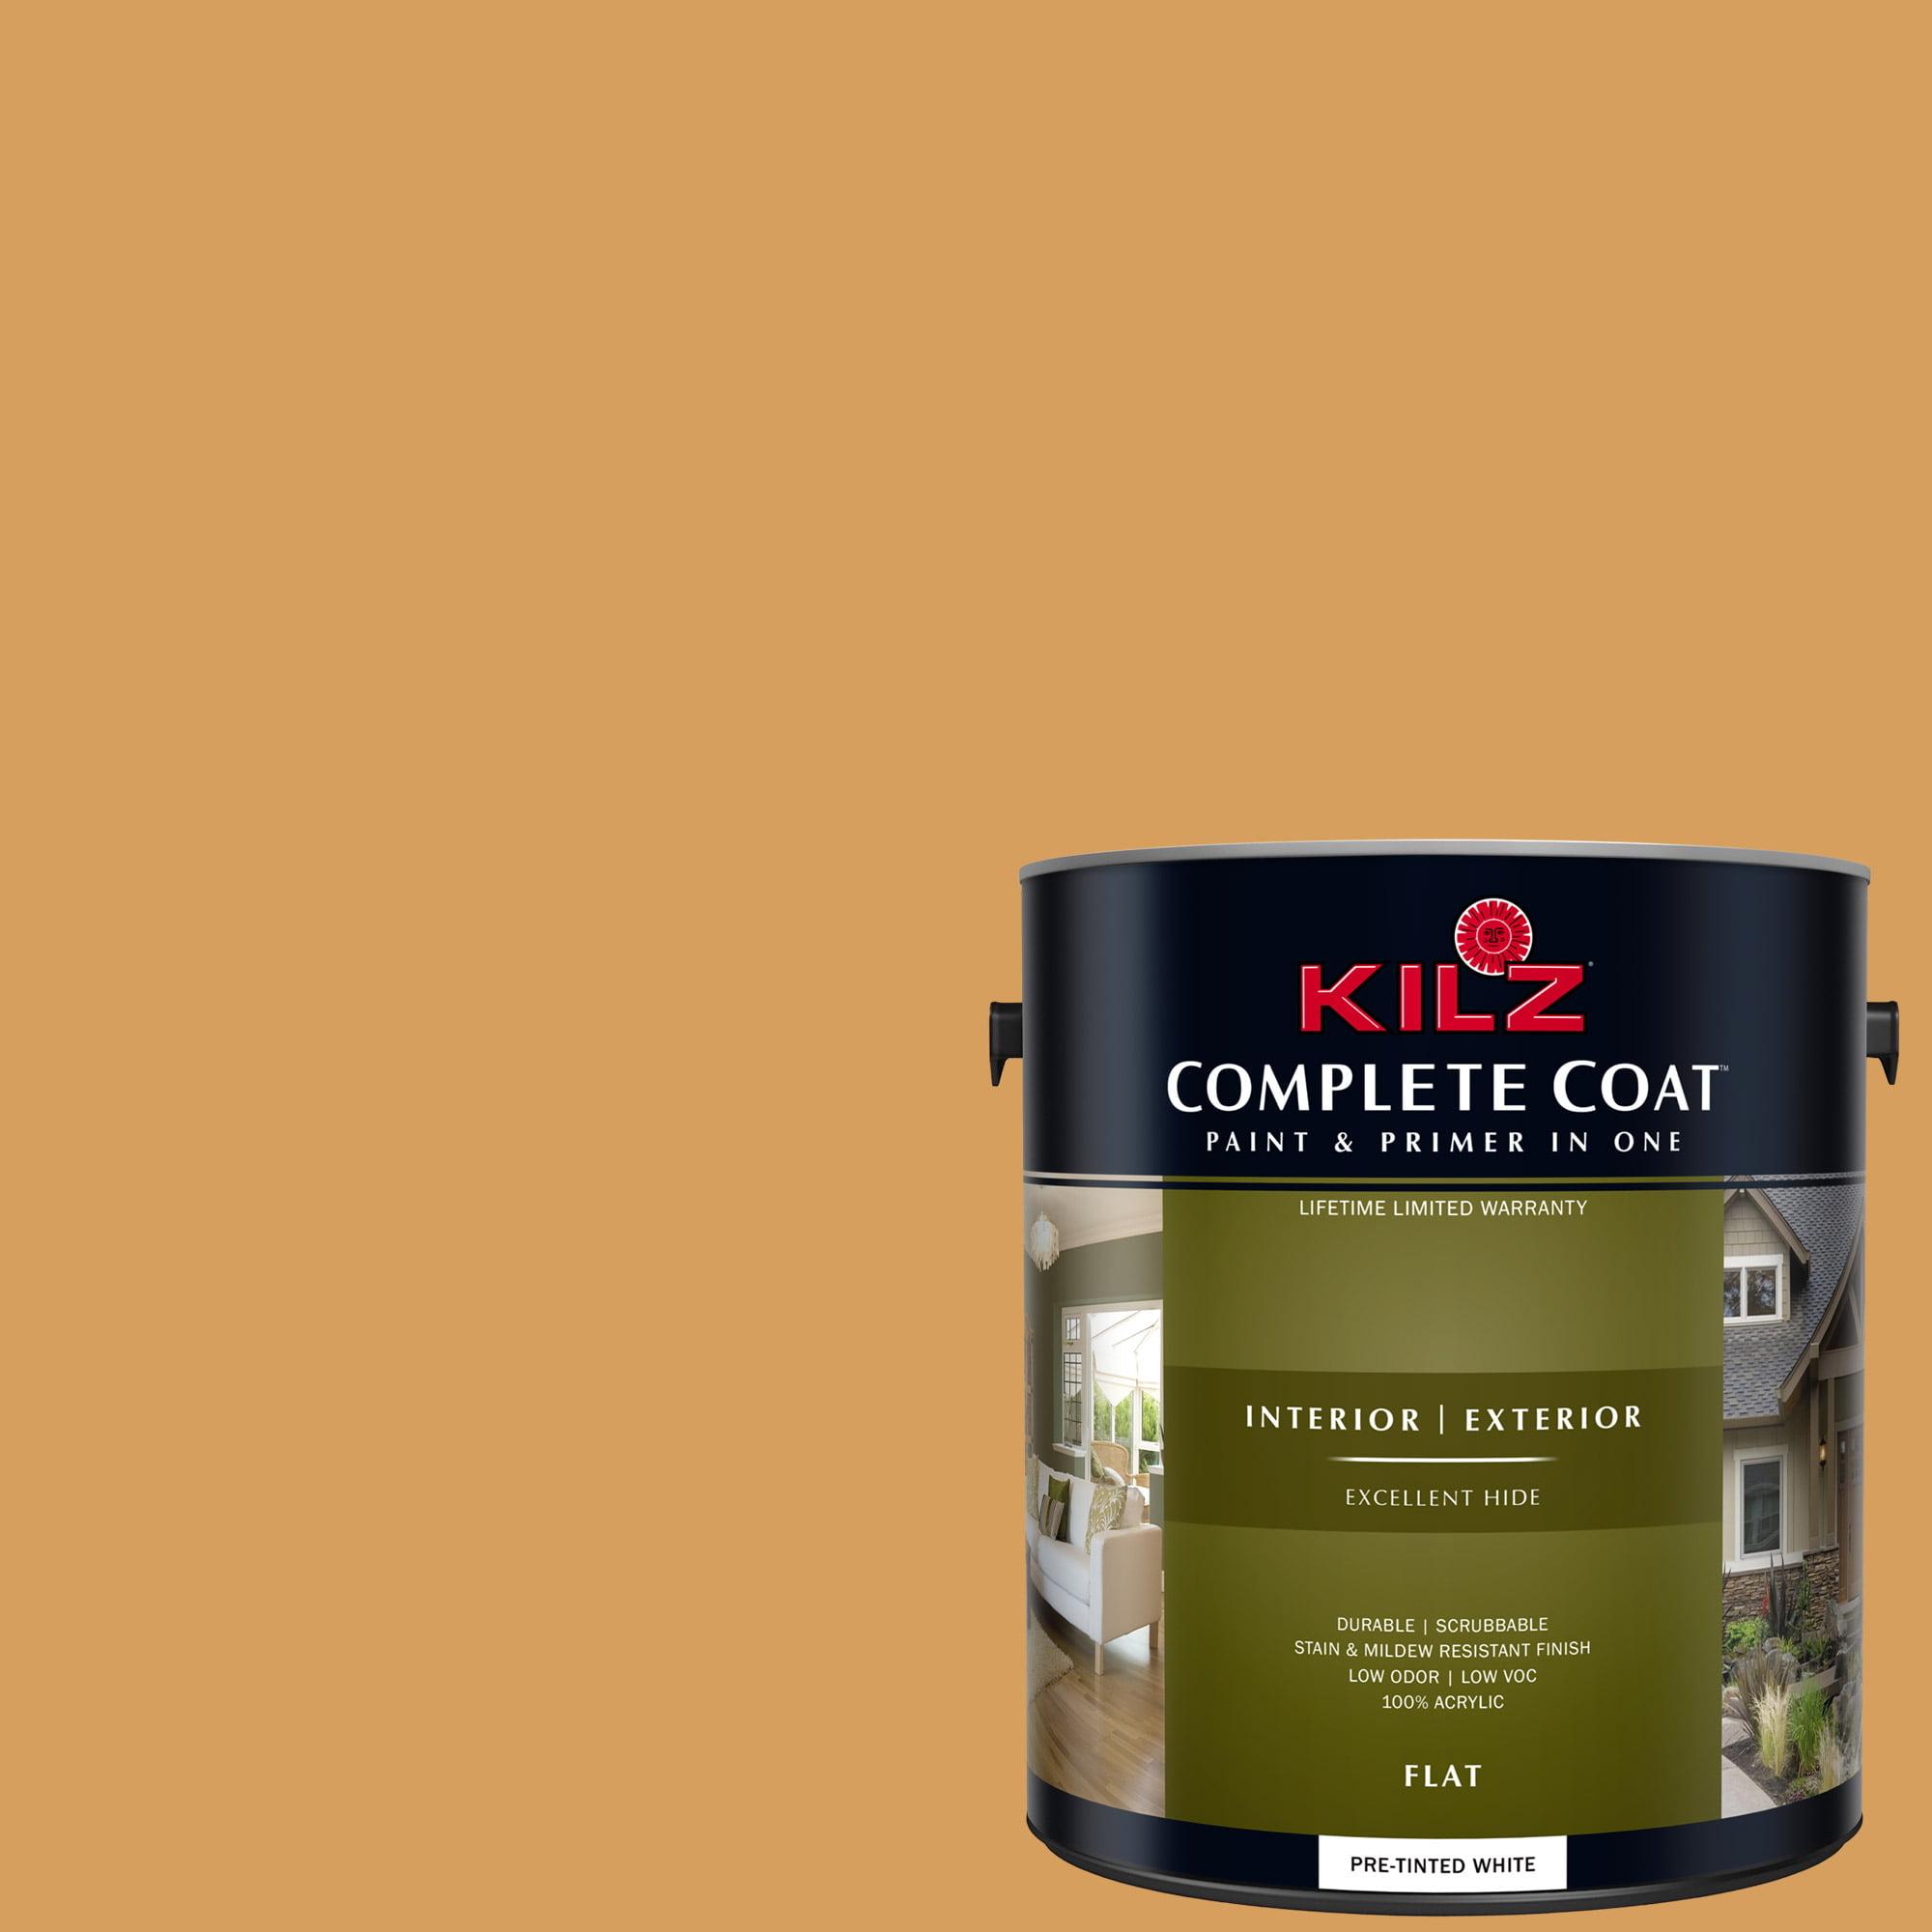 KILZ COMPLETE COAT Interior/Exterior Paint & Primer in One #LD280-01 Dingo